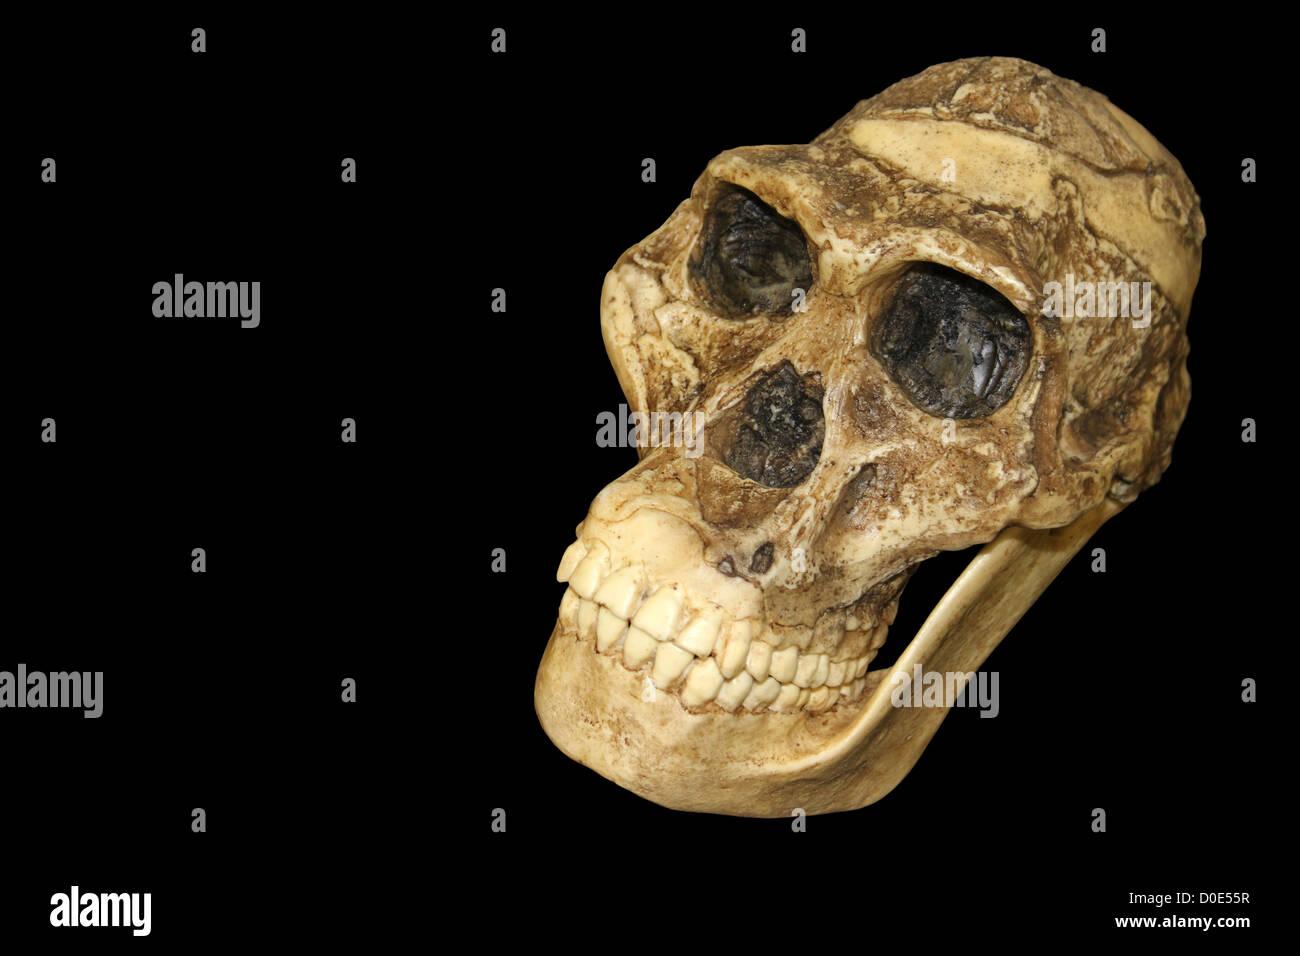 Australopithecus africanus Skull Sts 5 'Mrs. Ples' - Stock Image